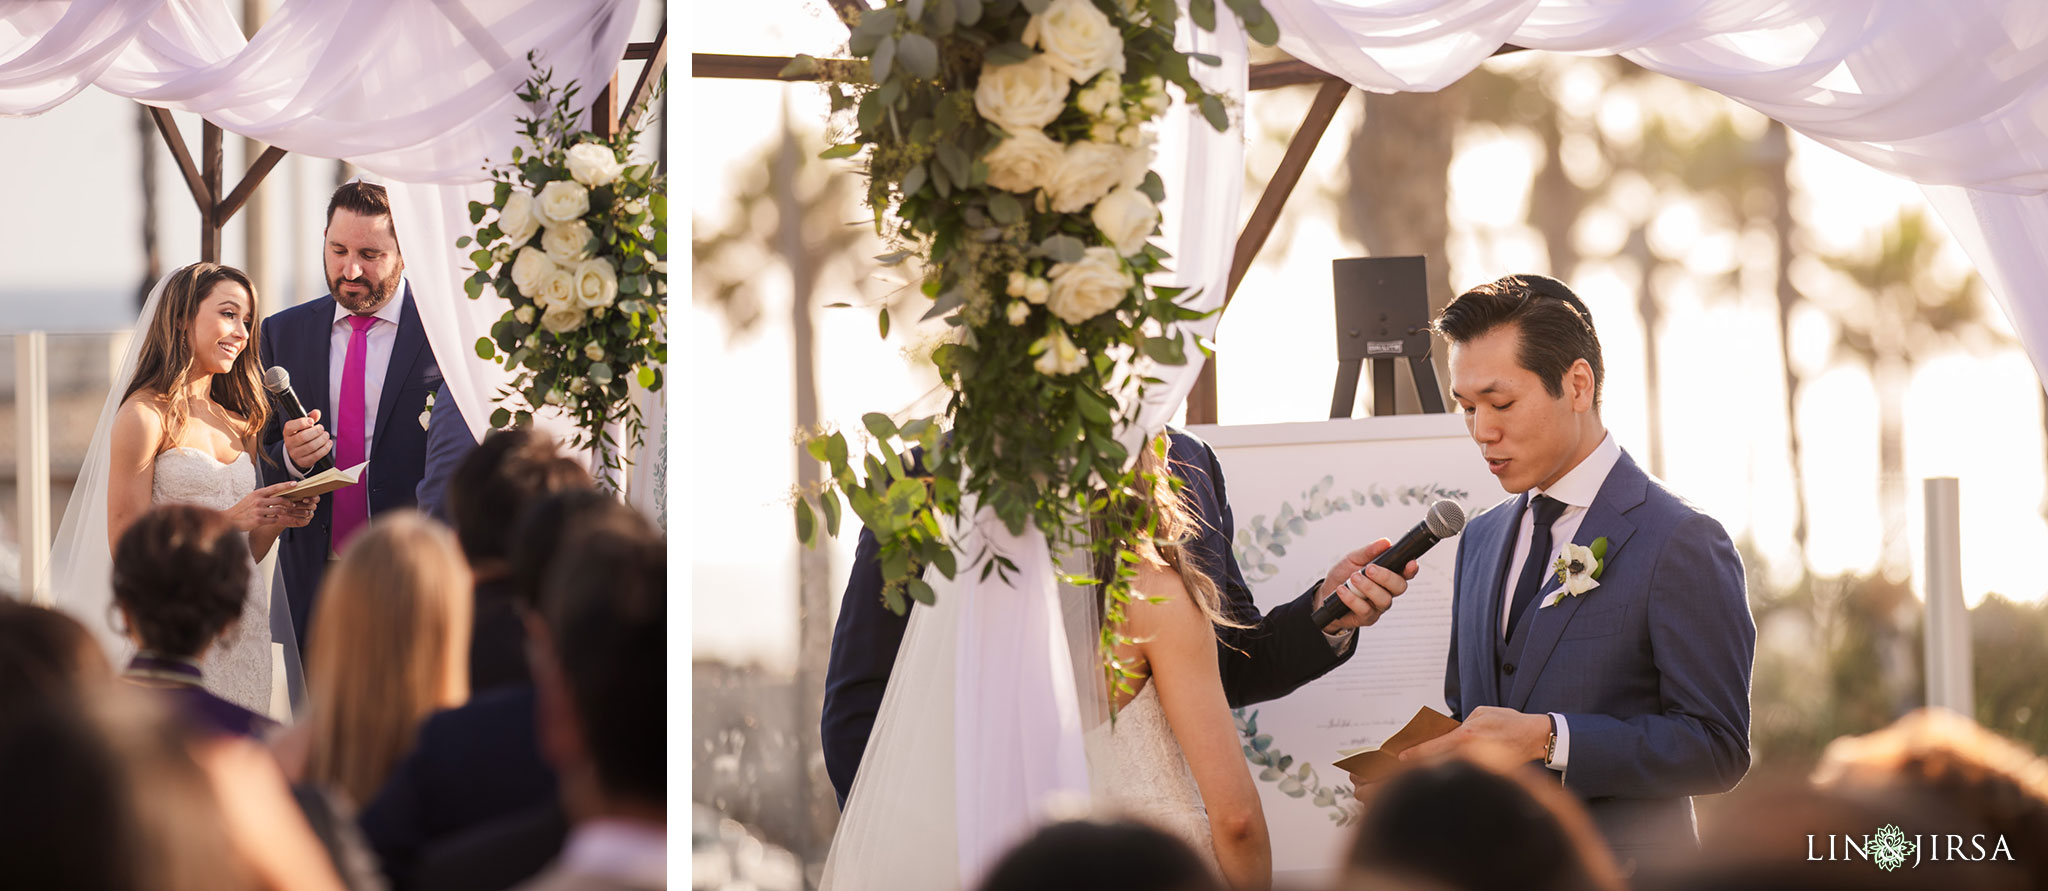 27 hyatt regency huntington beach wedding photography